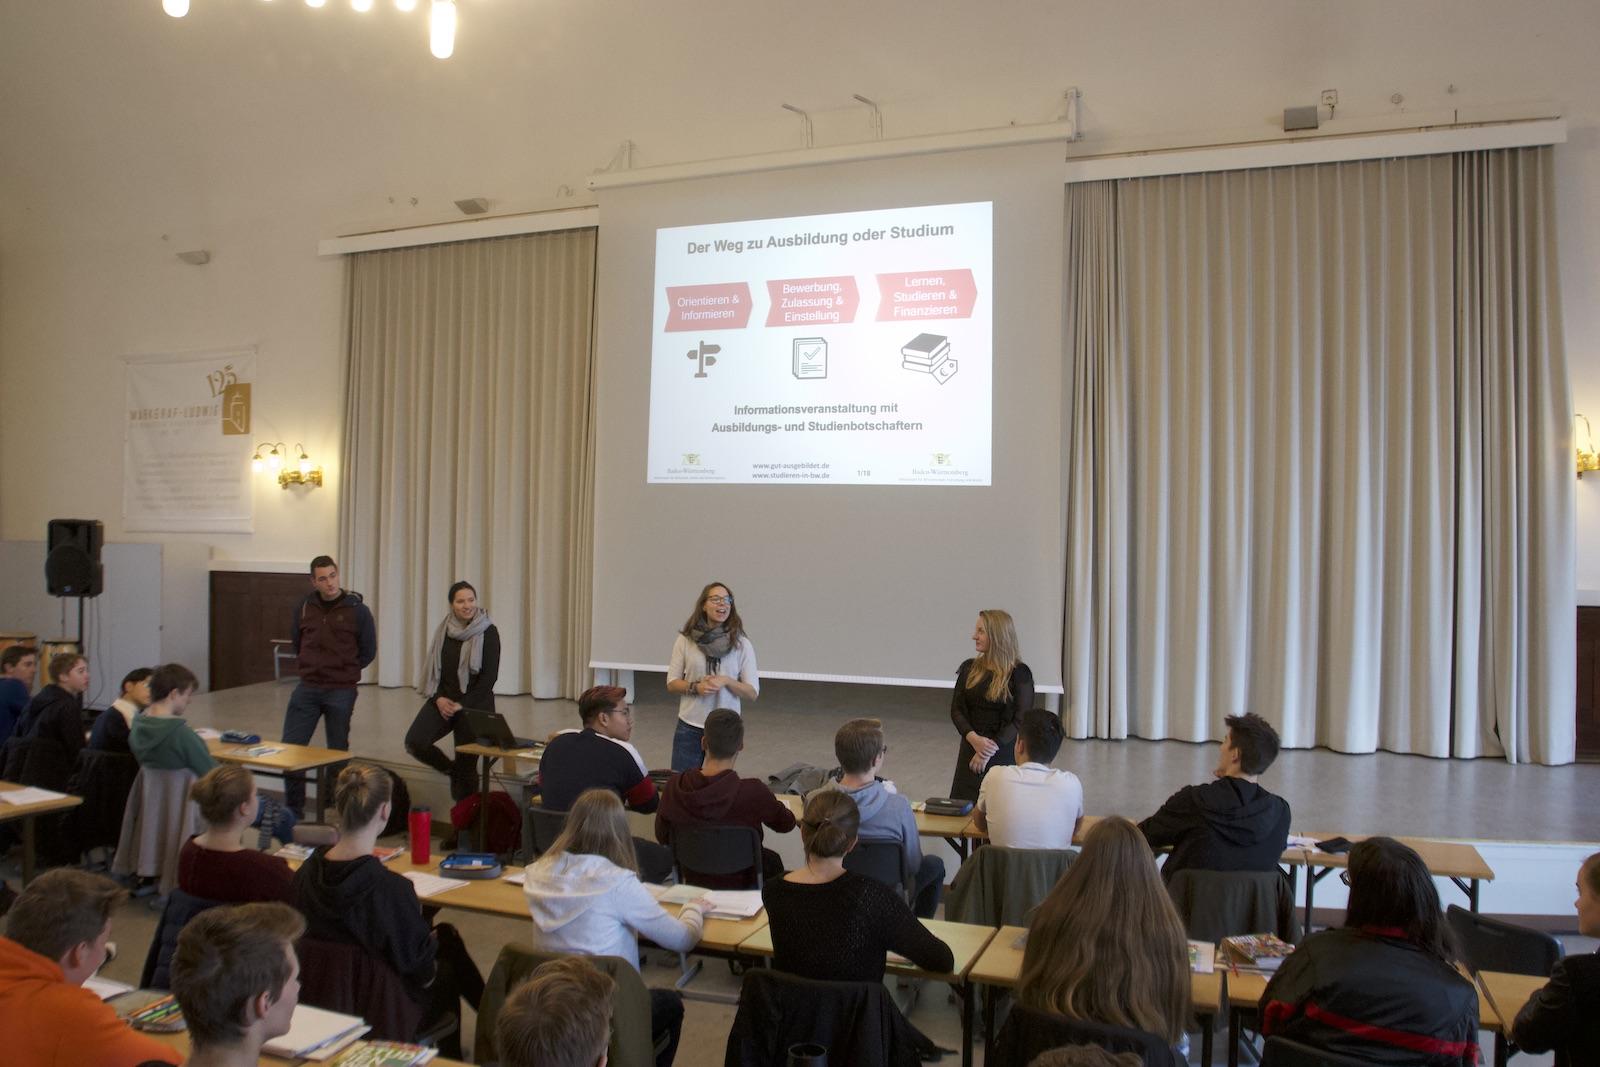 images/Inhalte_2018_19/Studienbotschafter.jpg